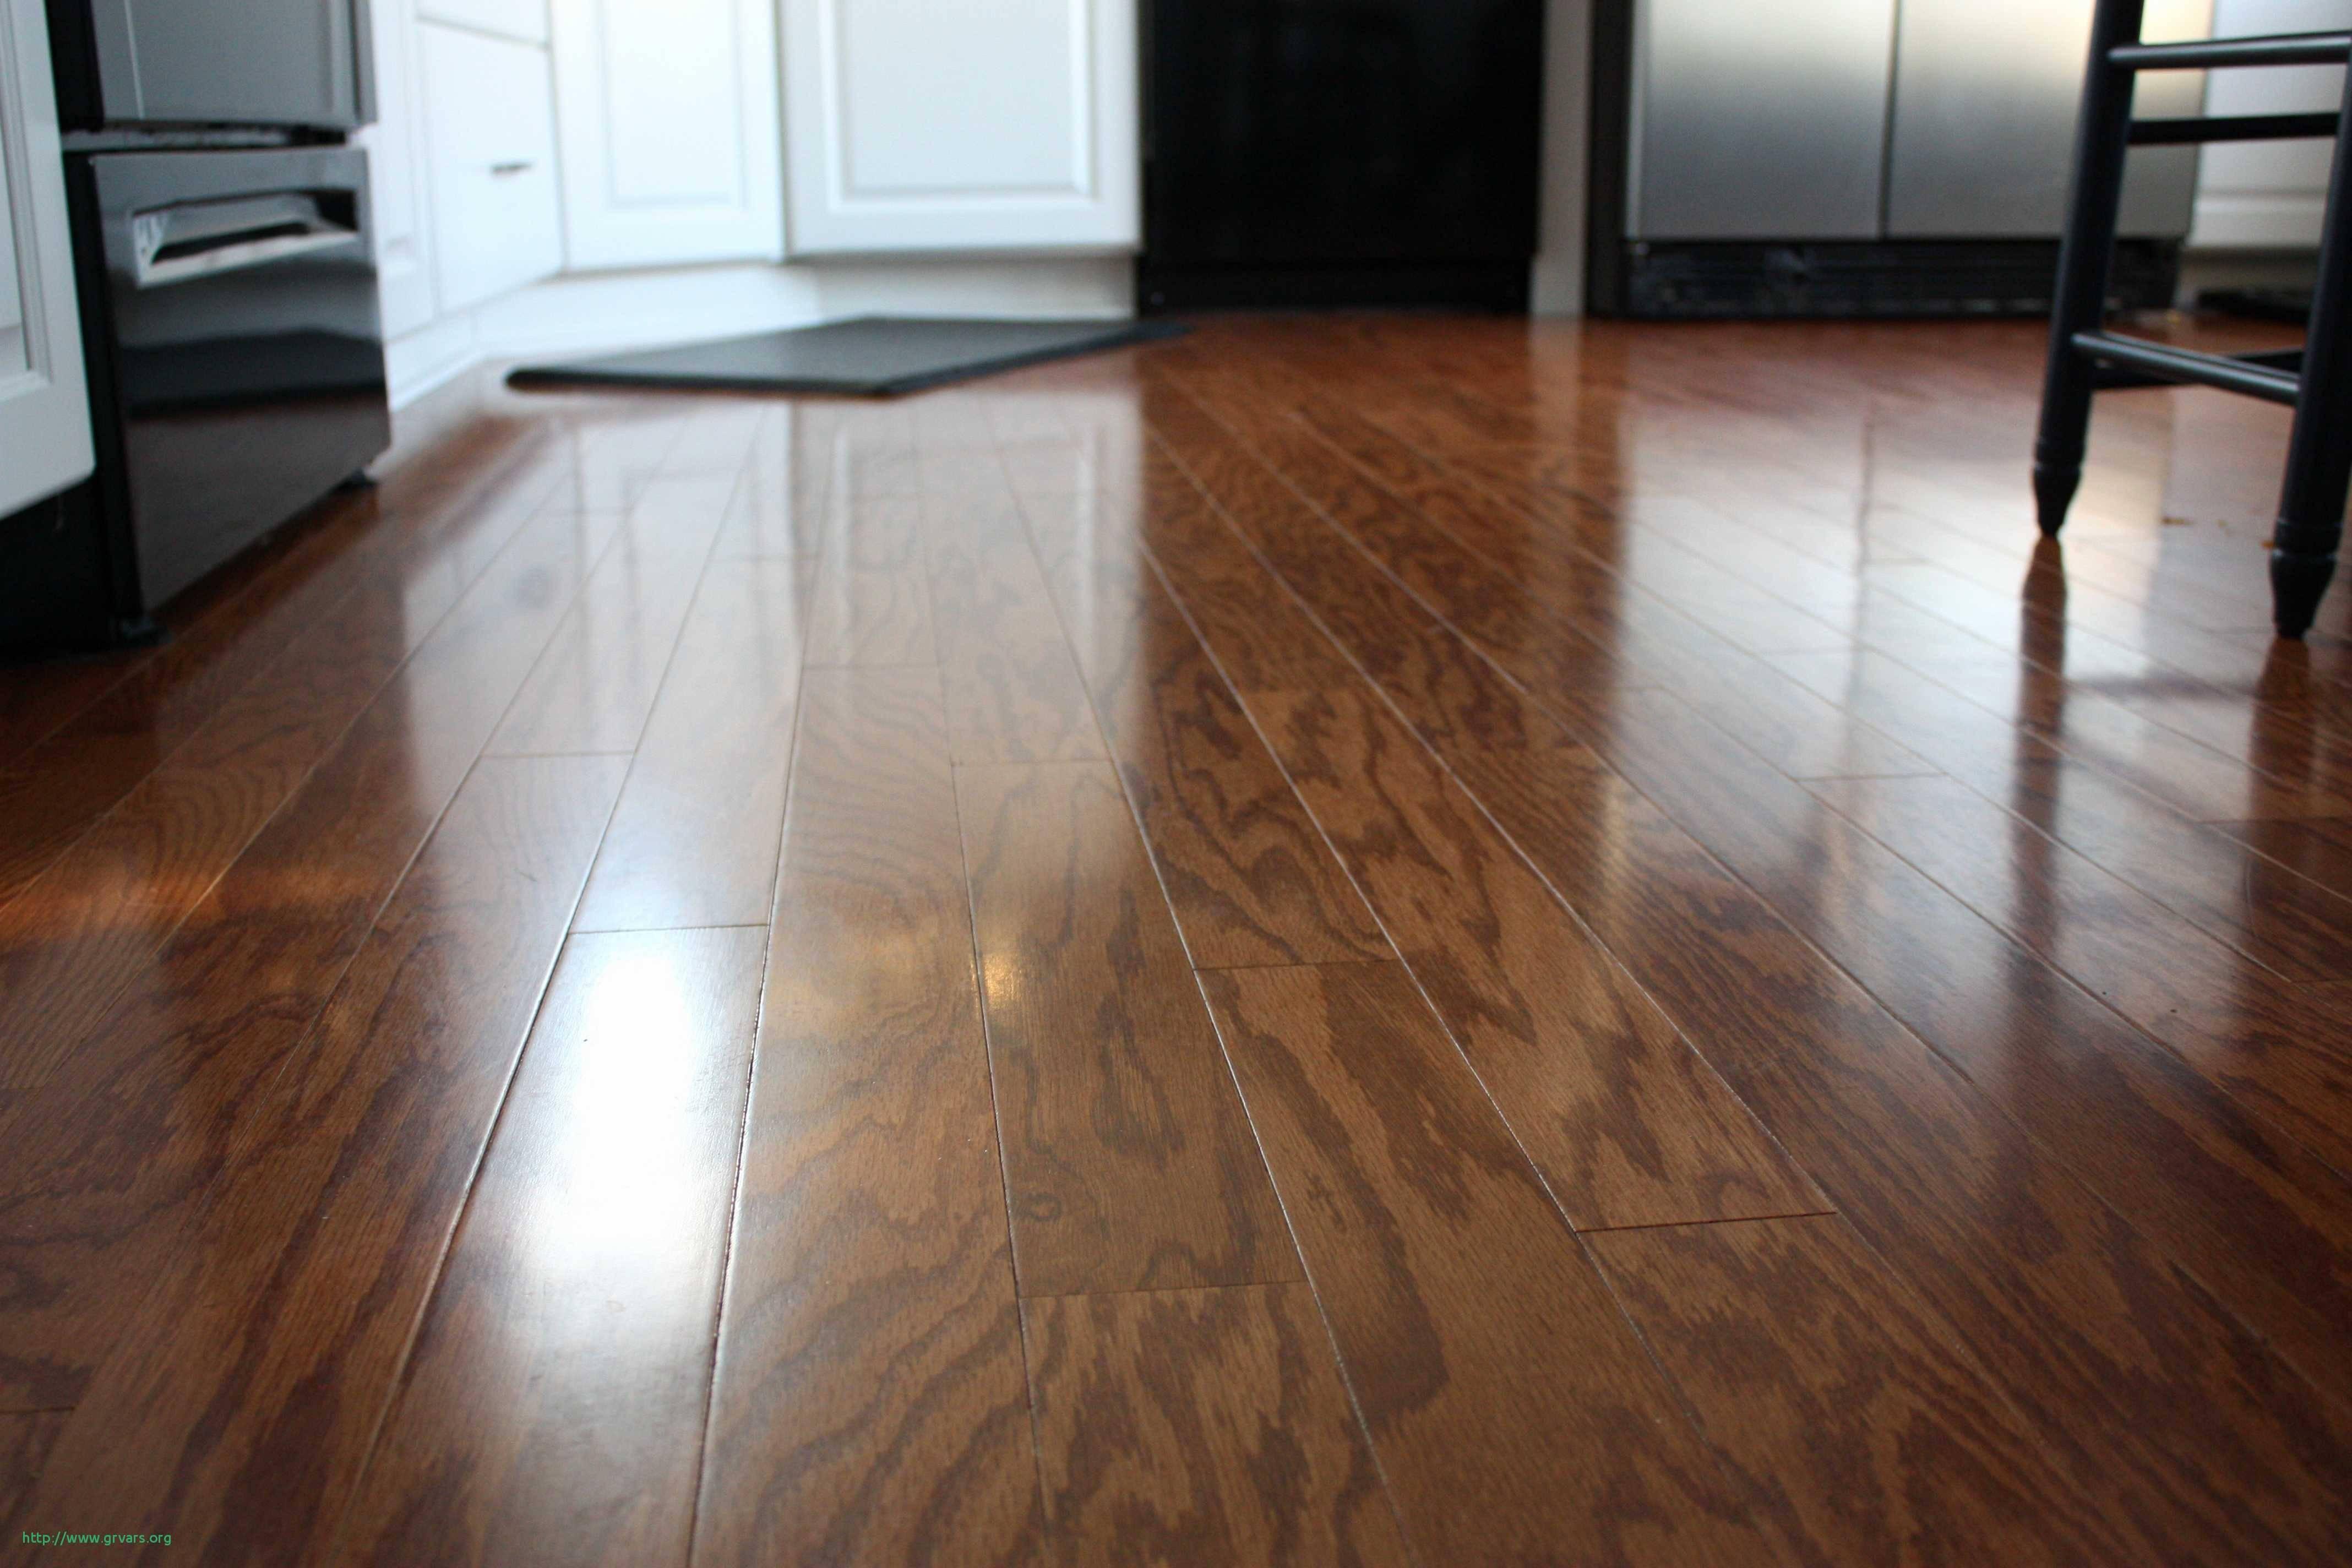 Clean Tile Floors With Vinegar Home Design